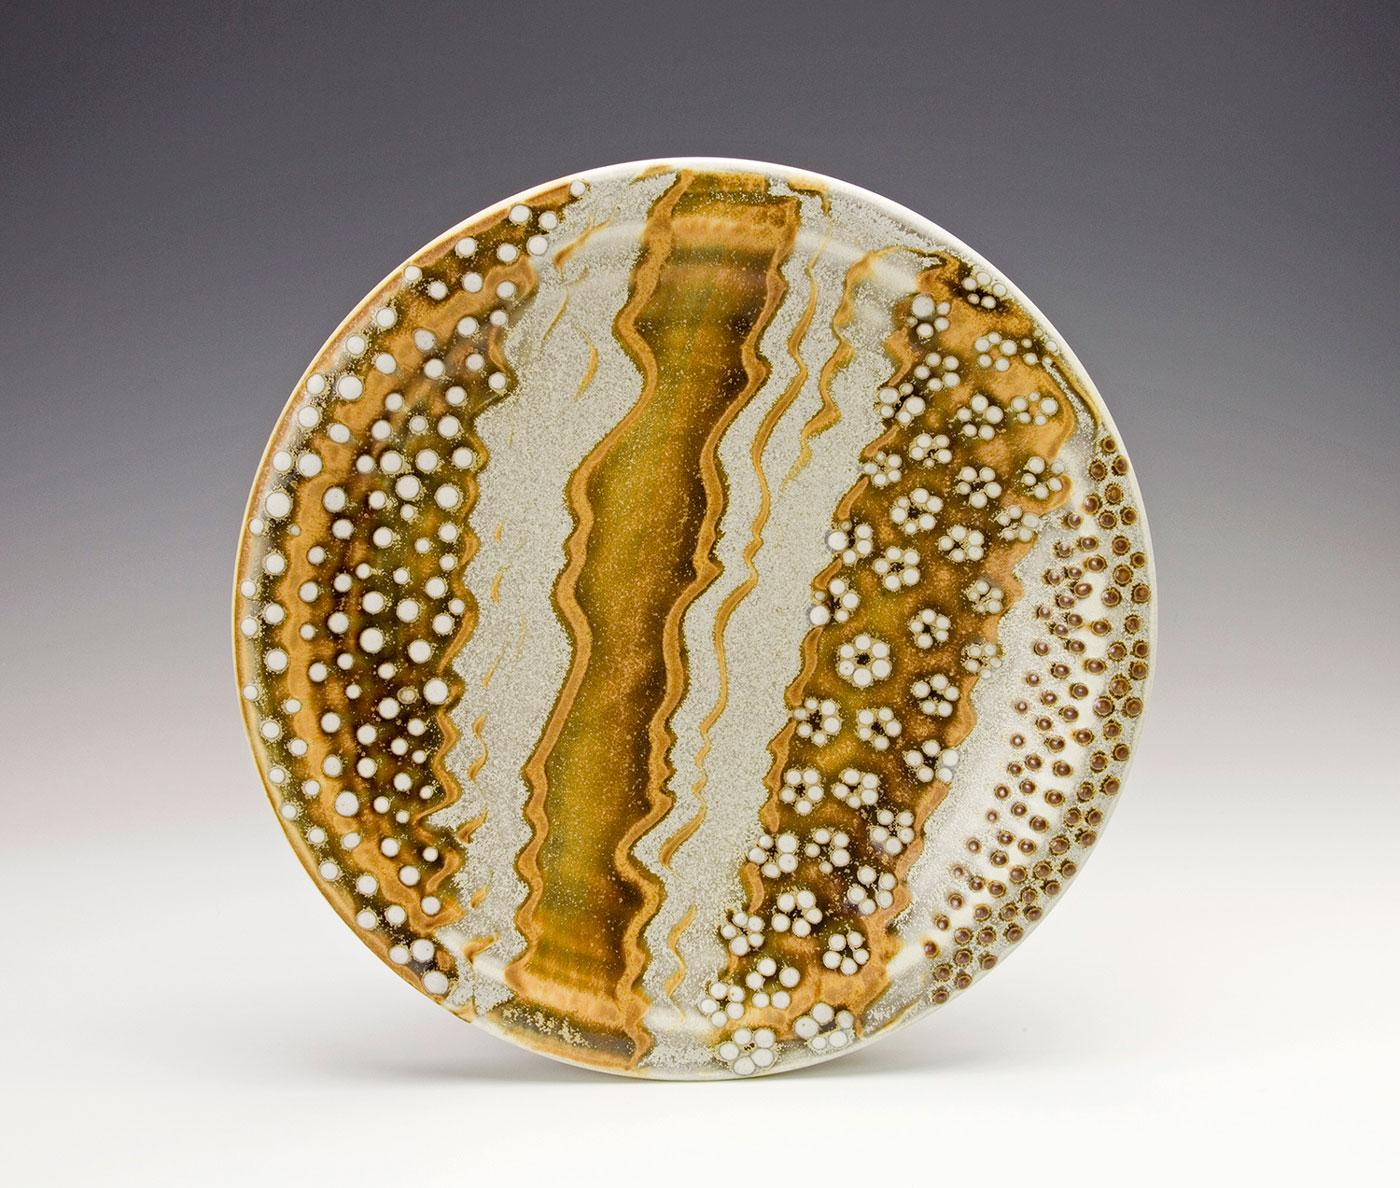 White-flower-dot-with-Moka-bronze-deco-plate-Samantha-Henneke.jpg